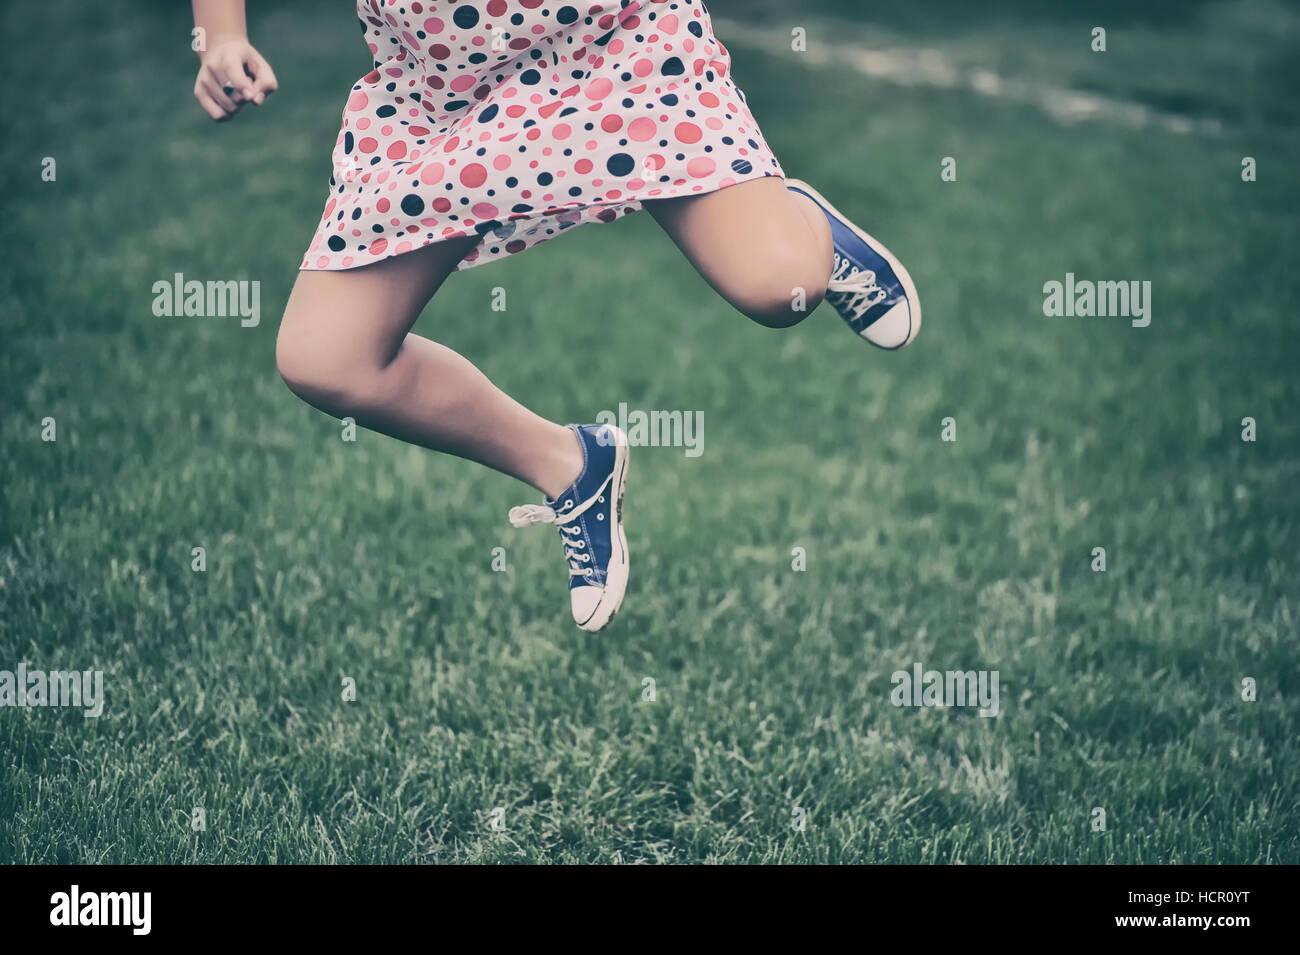 Chica corriendo al aire libre Imagen De Stock